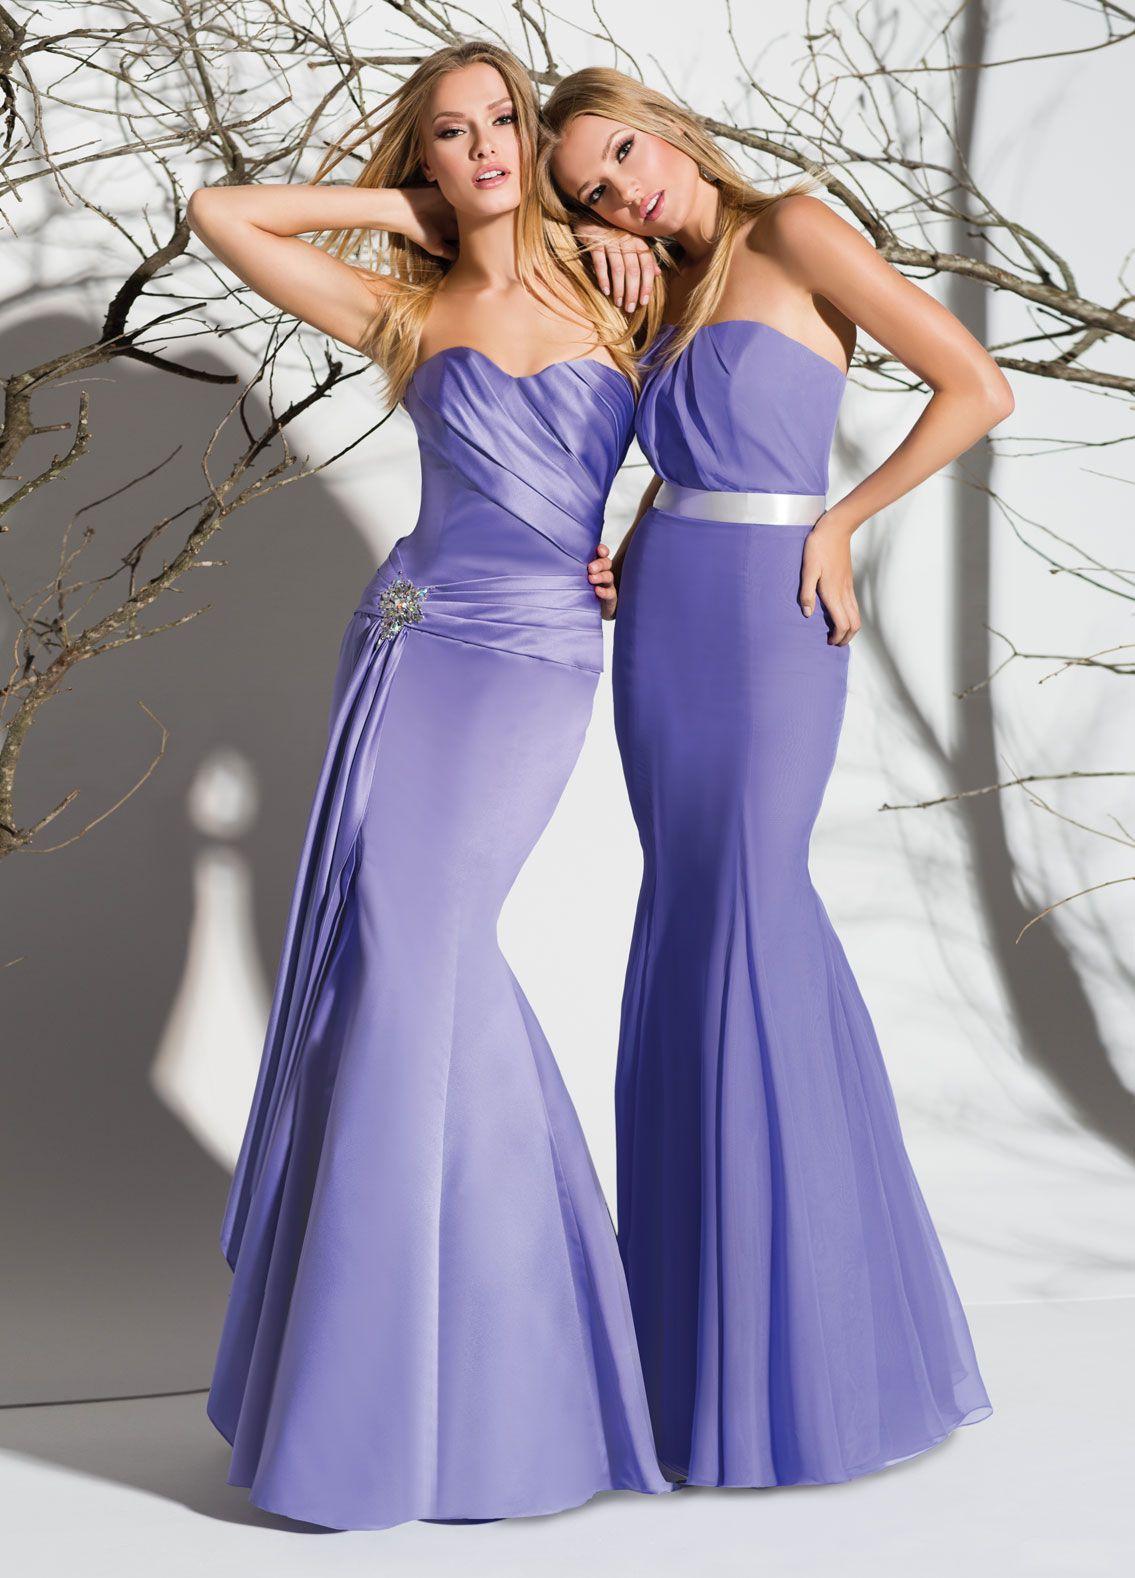 Impression bridesmaids separates styles and masquerade